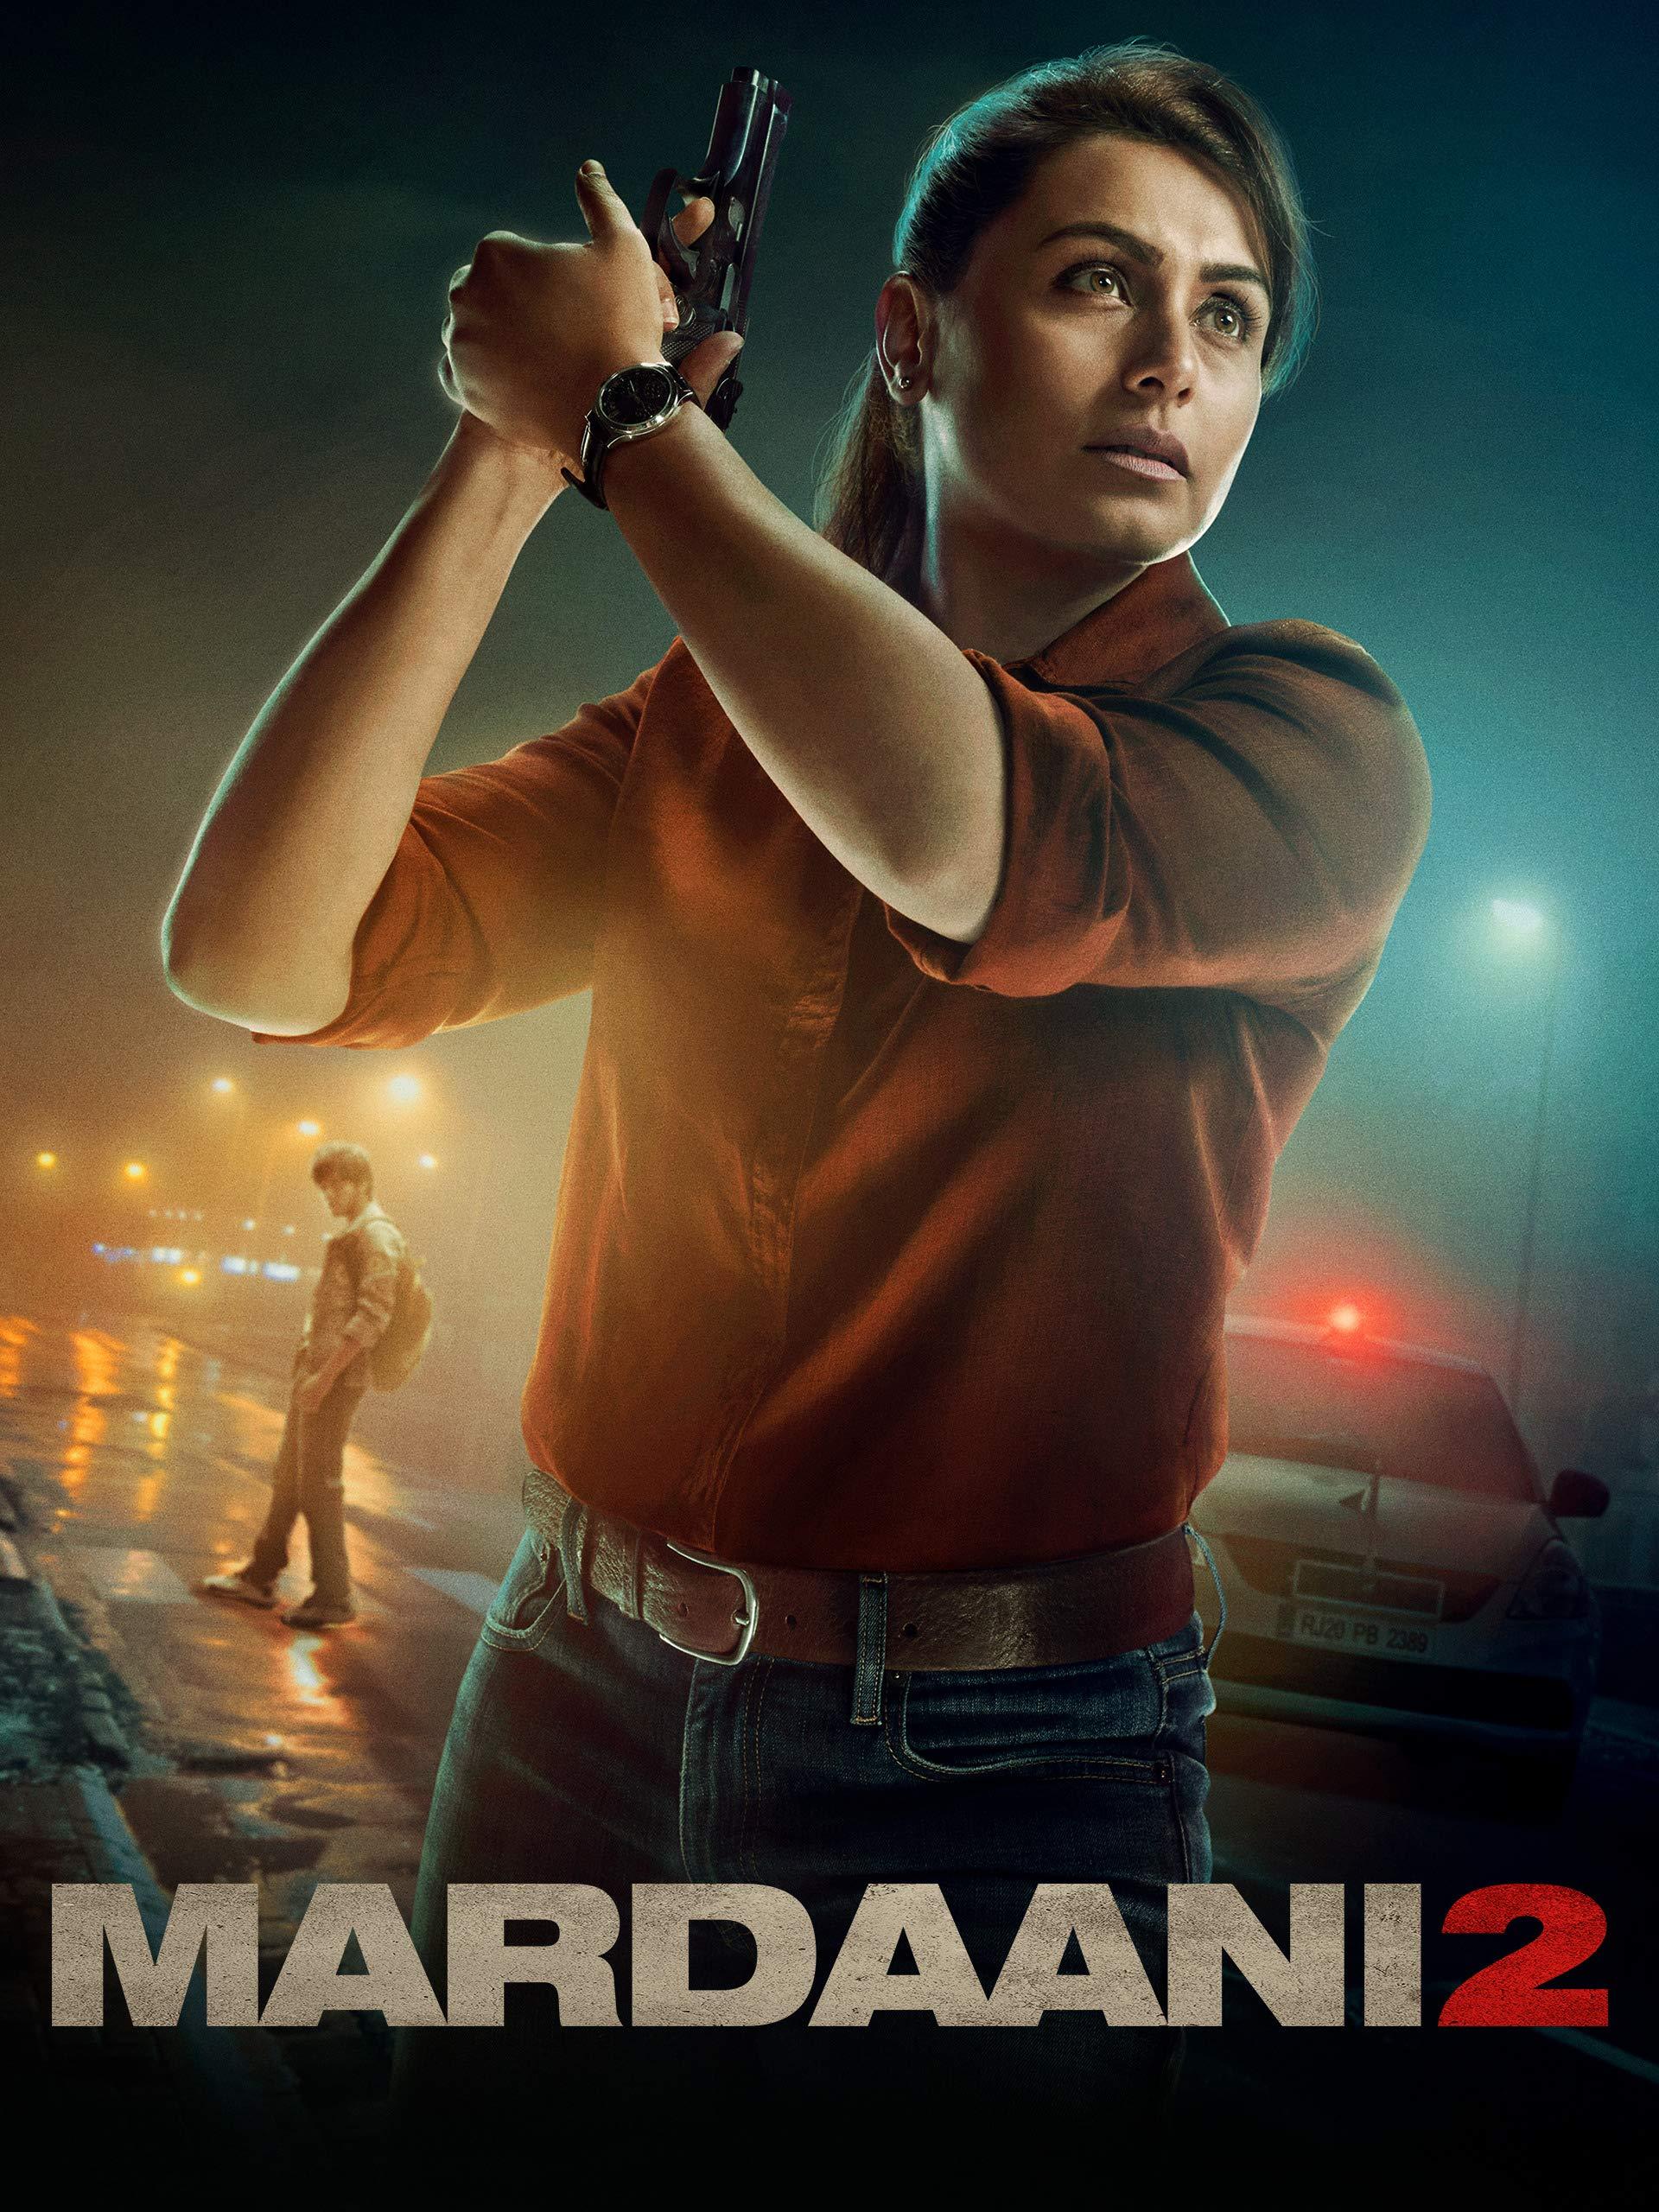 25+ Mardaani 2014 Mardaani Full Movie Download PNG